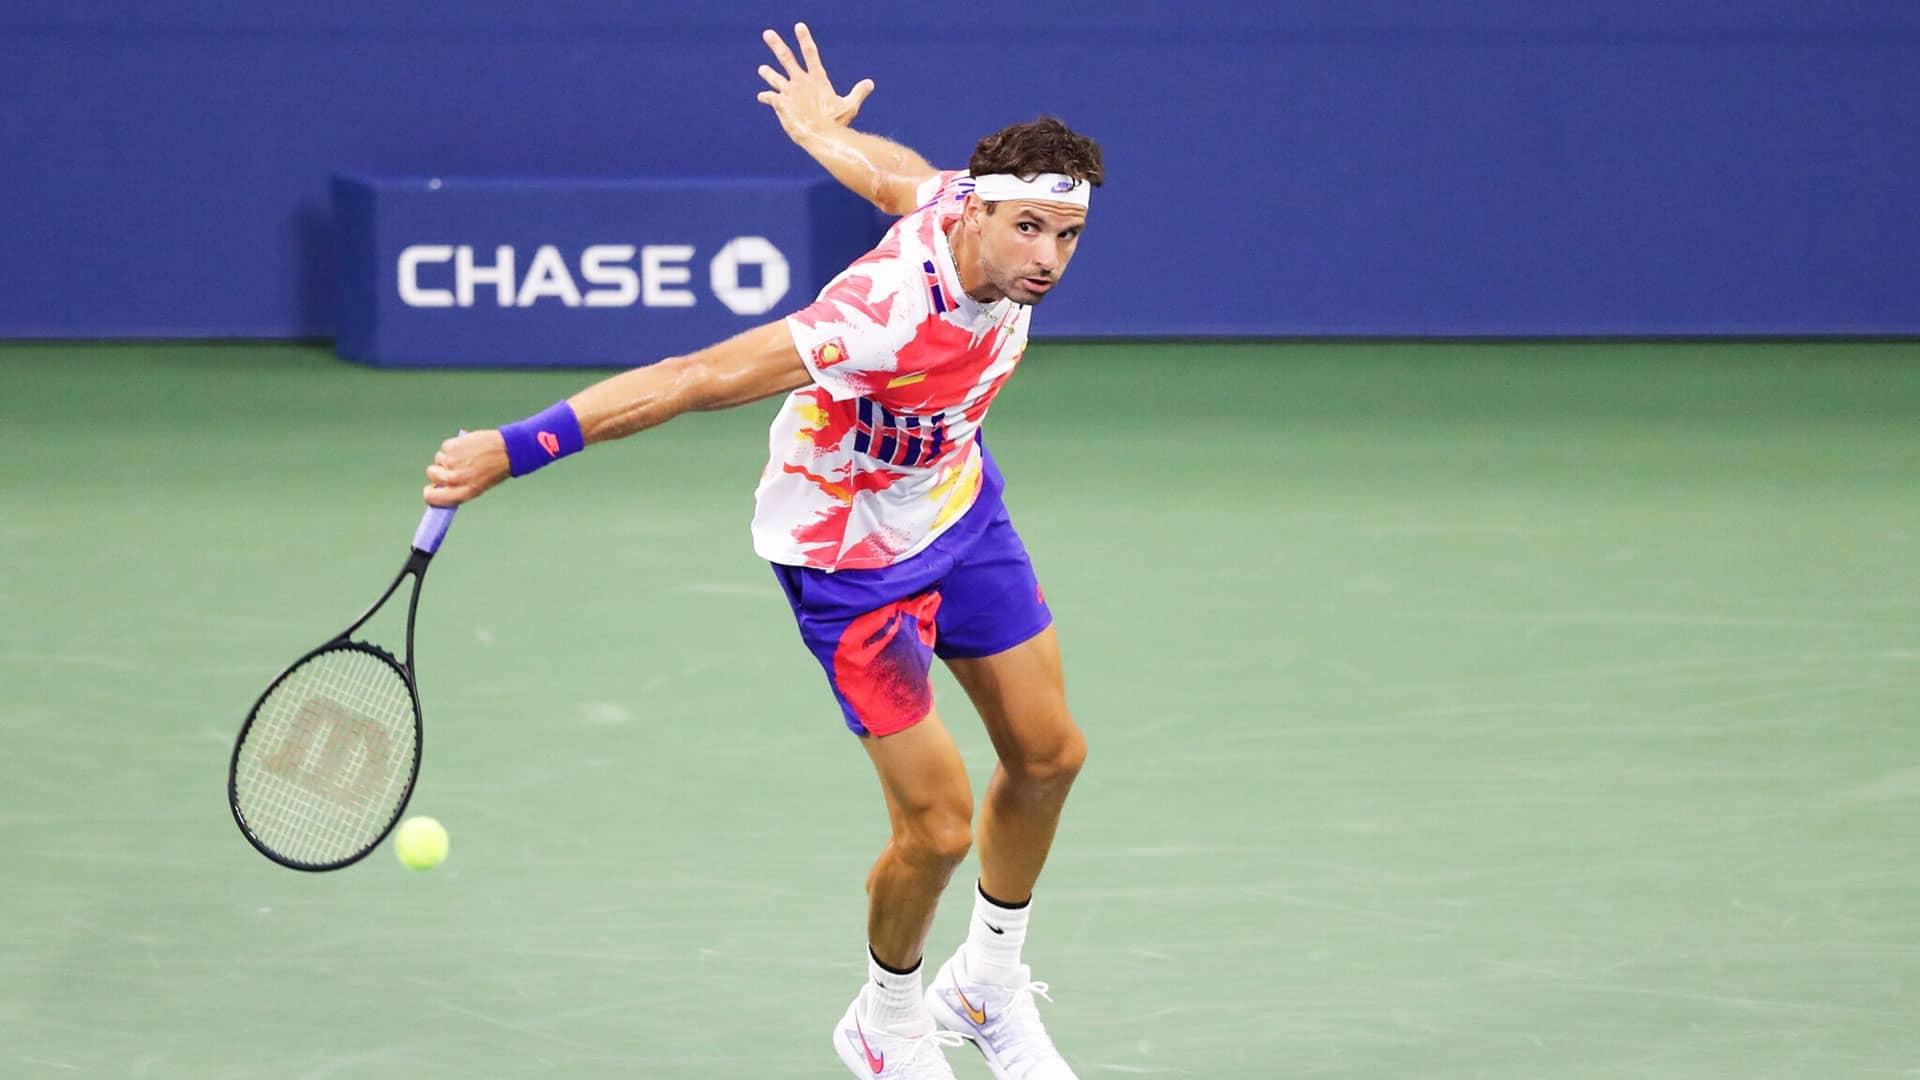 Dimitrov <a href='/en/tournaments/us-open/560/overview'>US Open</a> 2020 Day 2